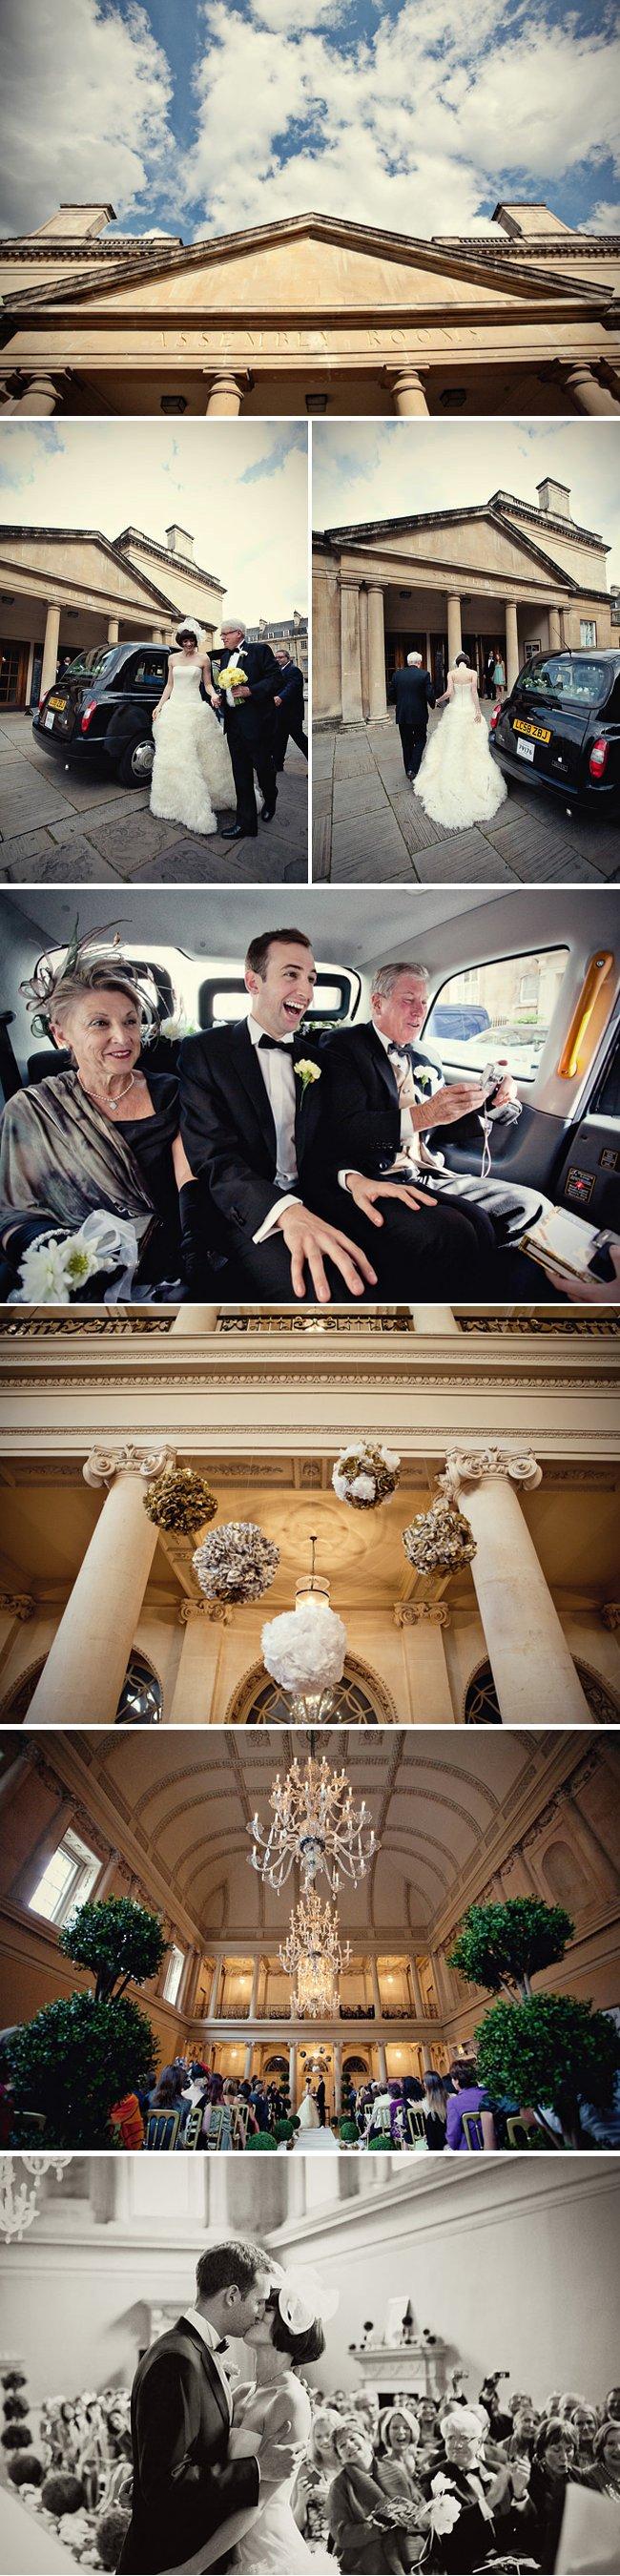 London-real-wedding-elegant-ceremony-venue.full